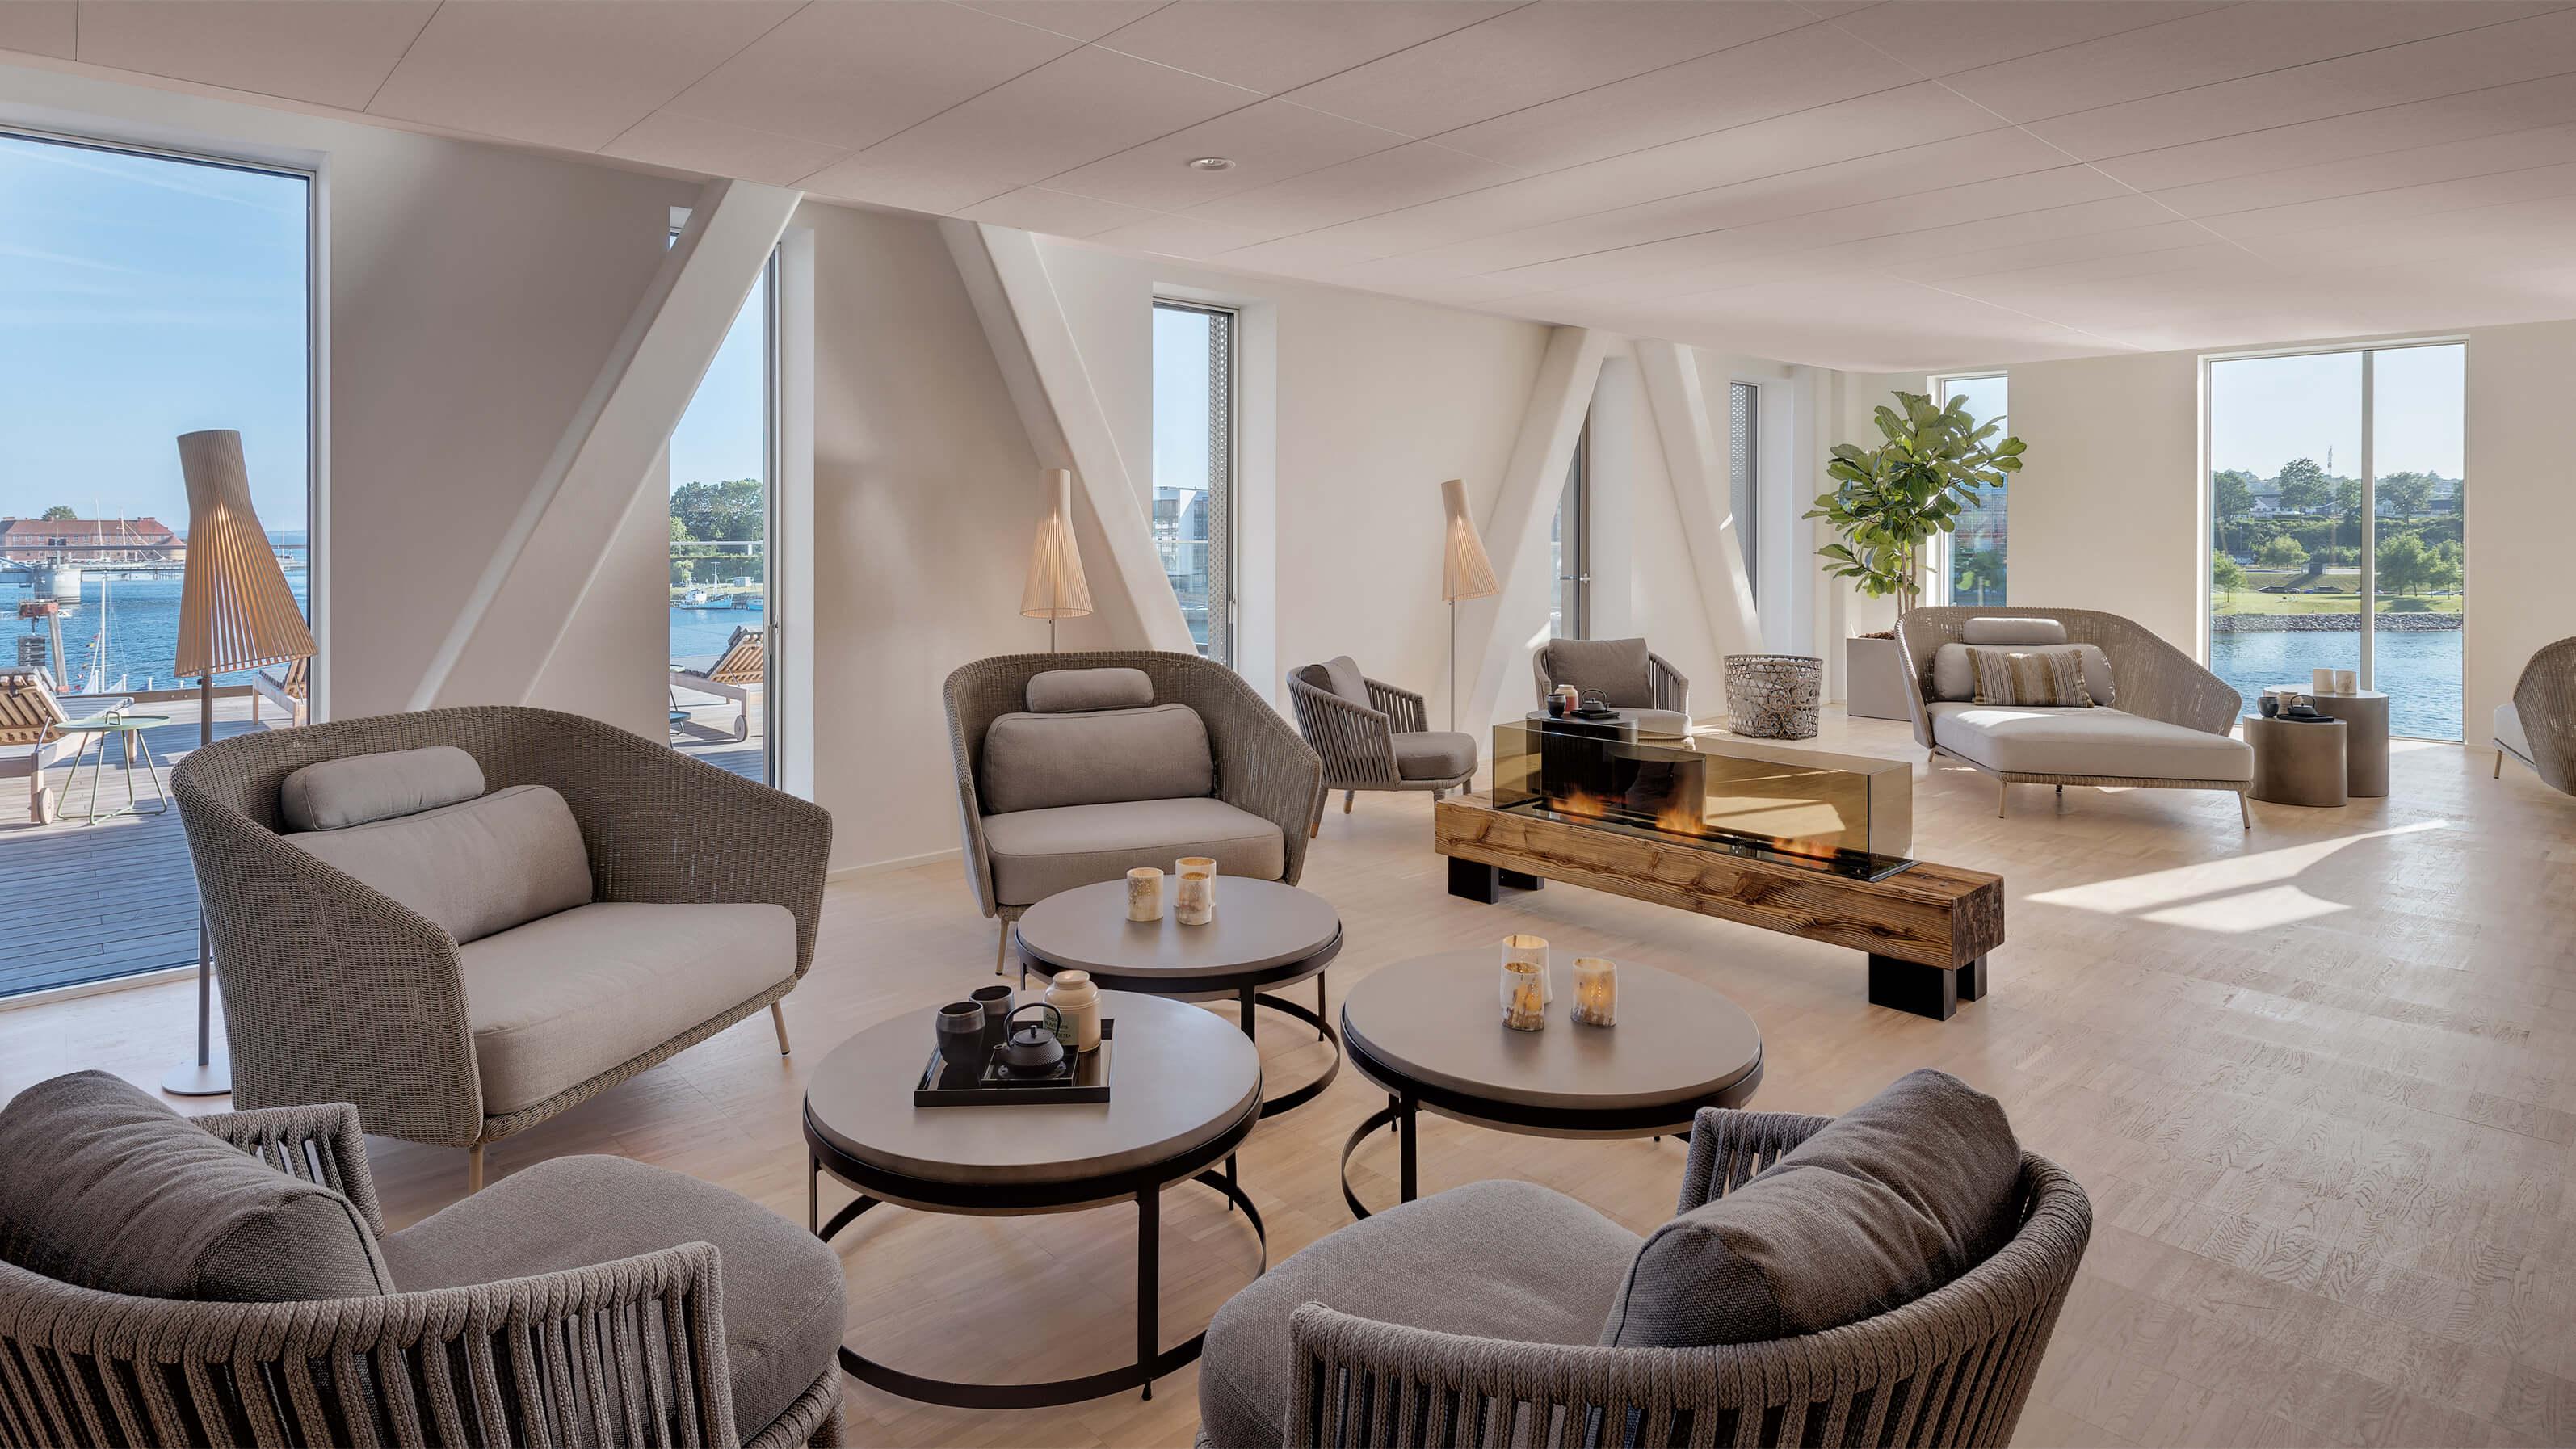 hotelausstattung-hoteleinrichtungen-bachhuber-Alsik-Sonderborg10